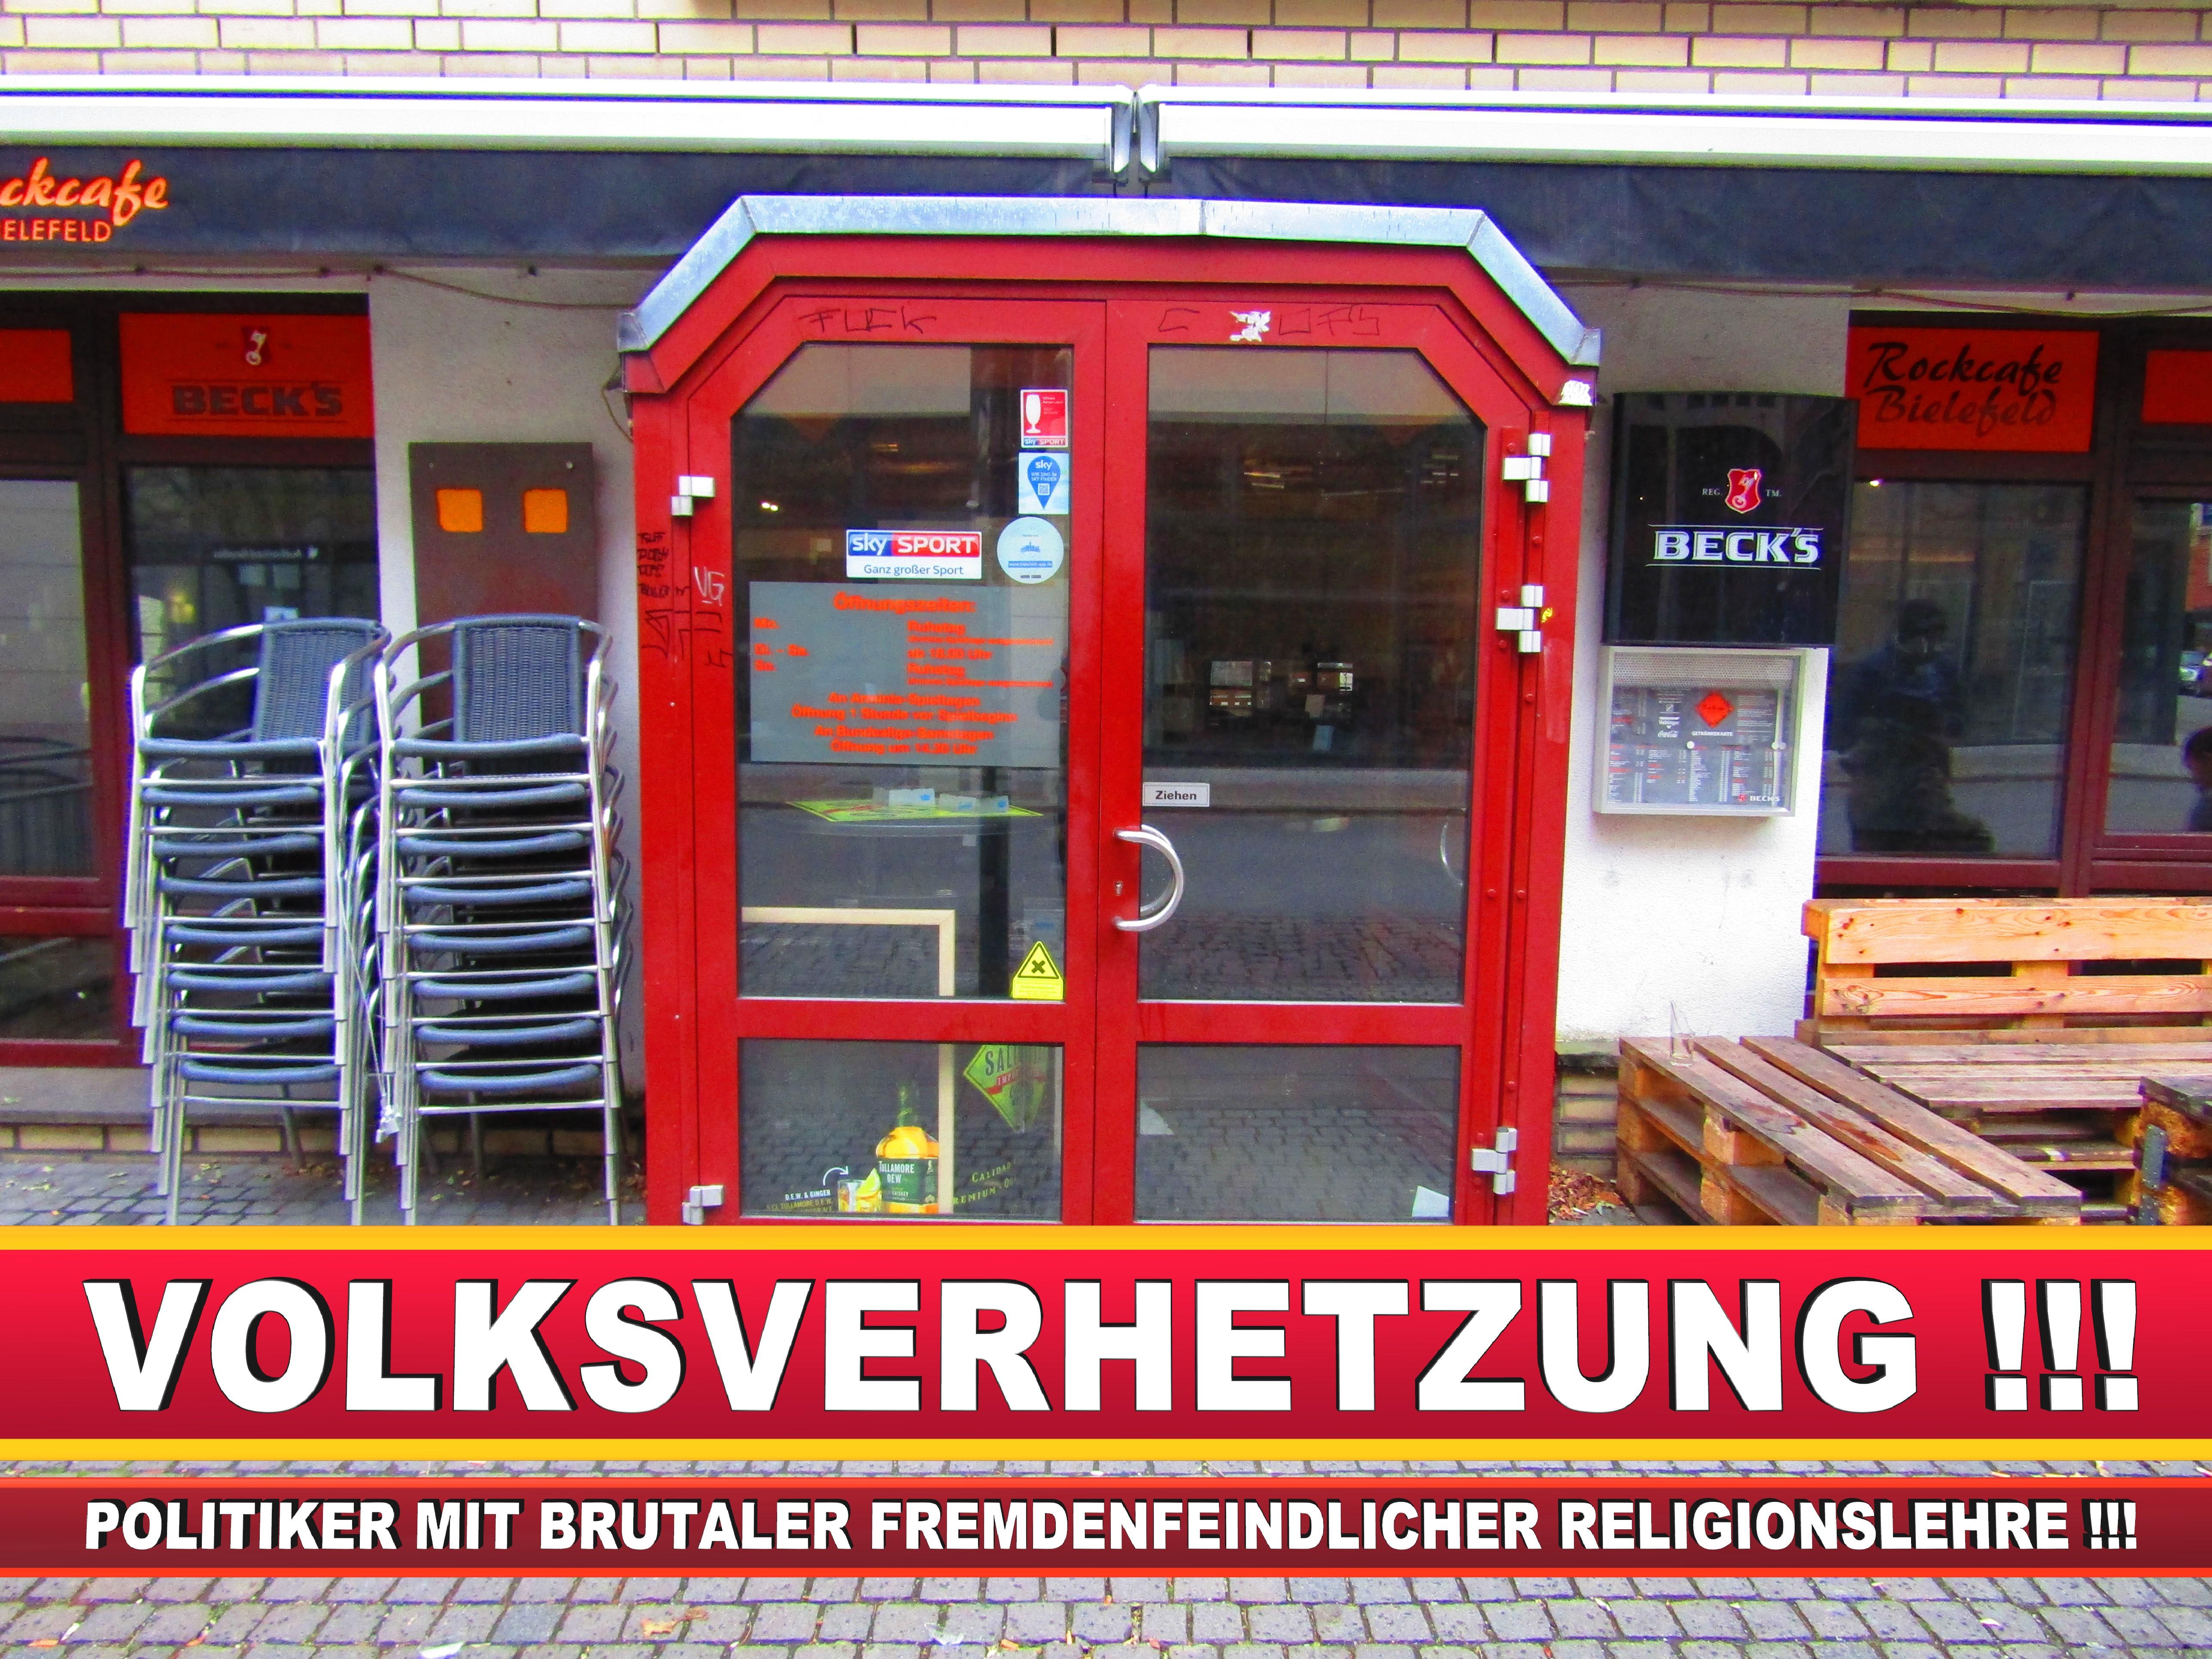 ROCKCAFE BIELEFELD NEUSTäDTER STR 25 33602 CDU BIELEFELD NRW (3)